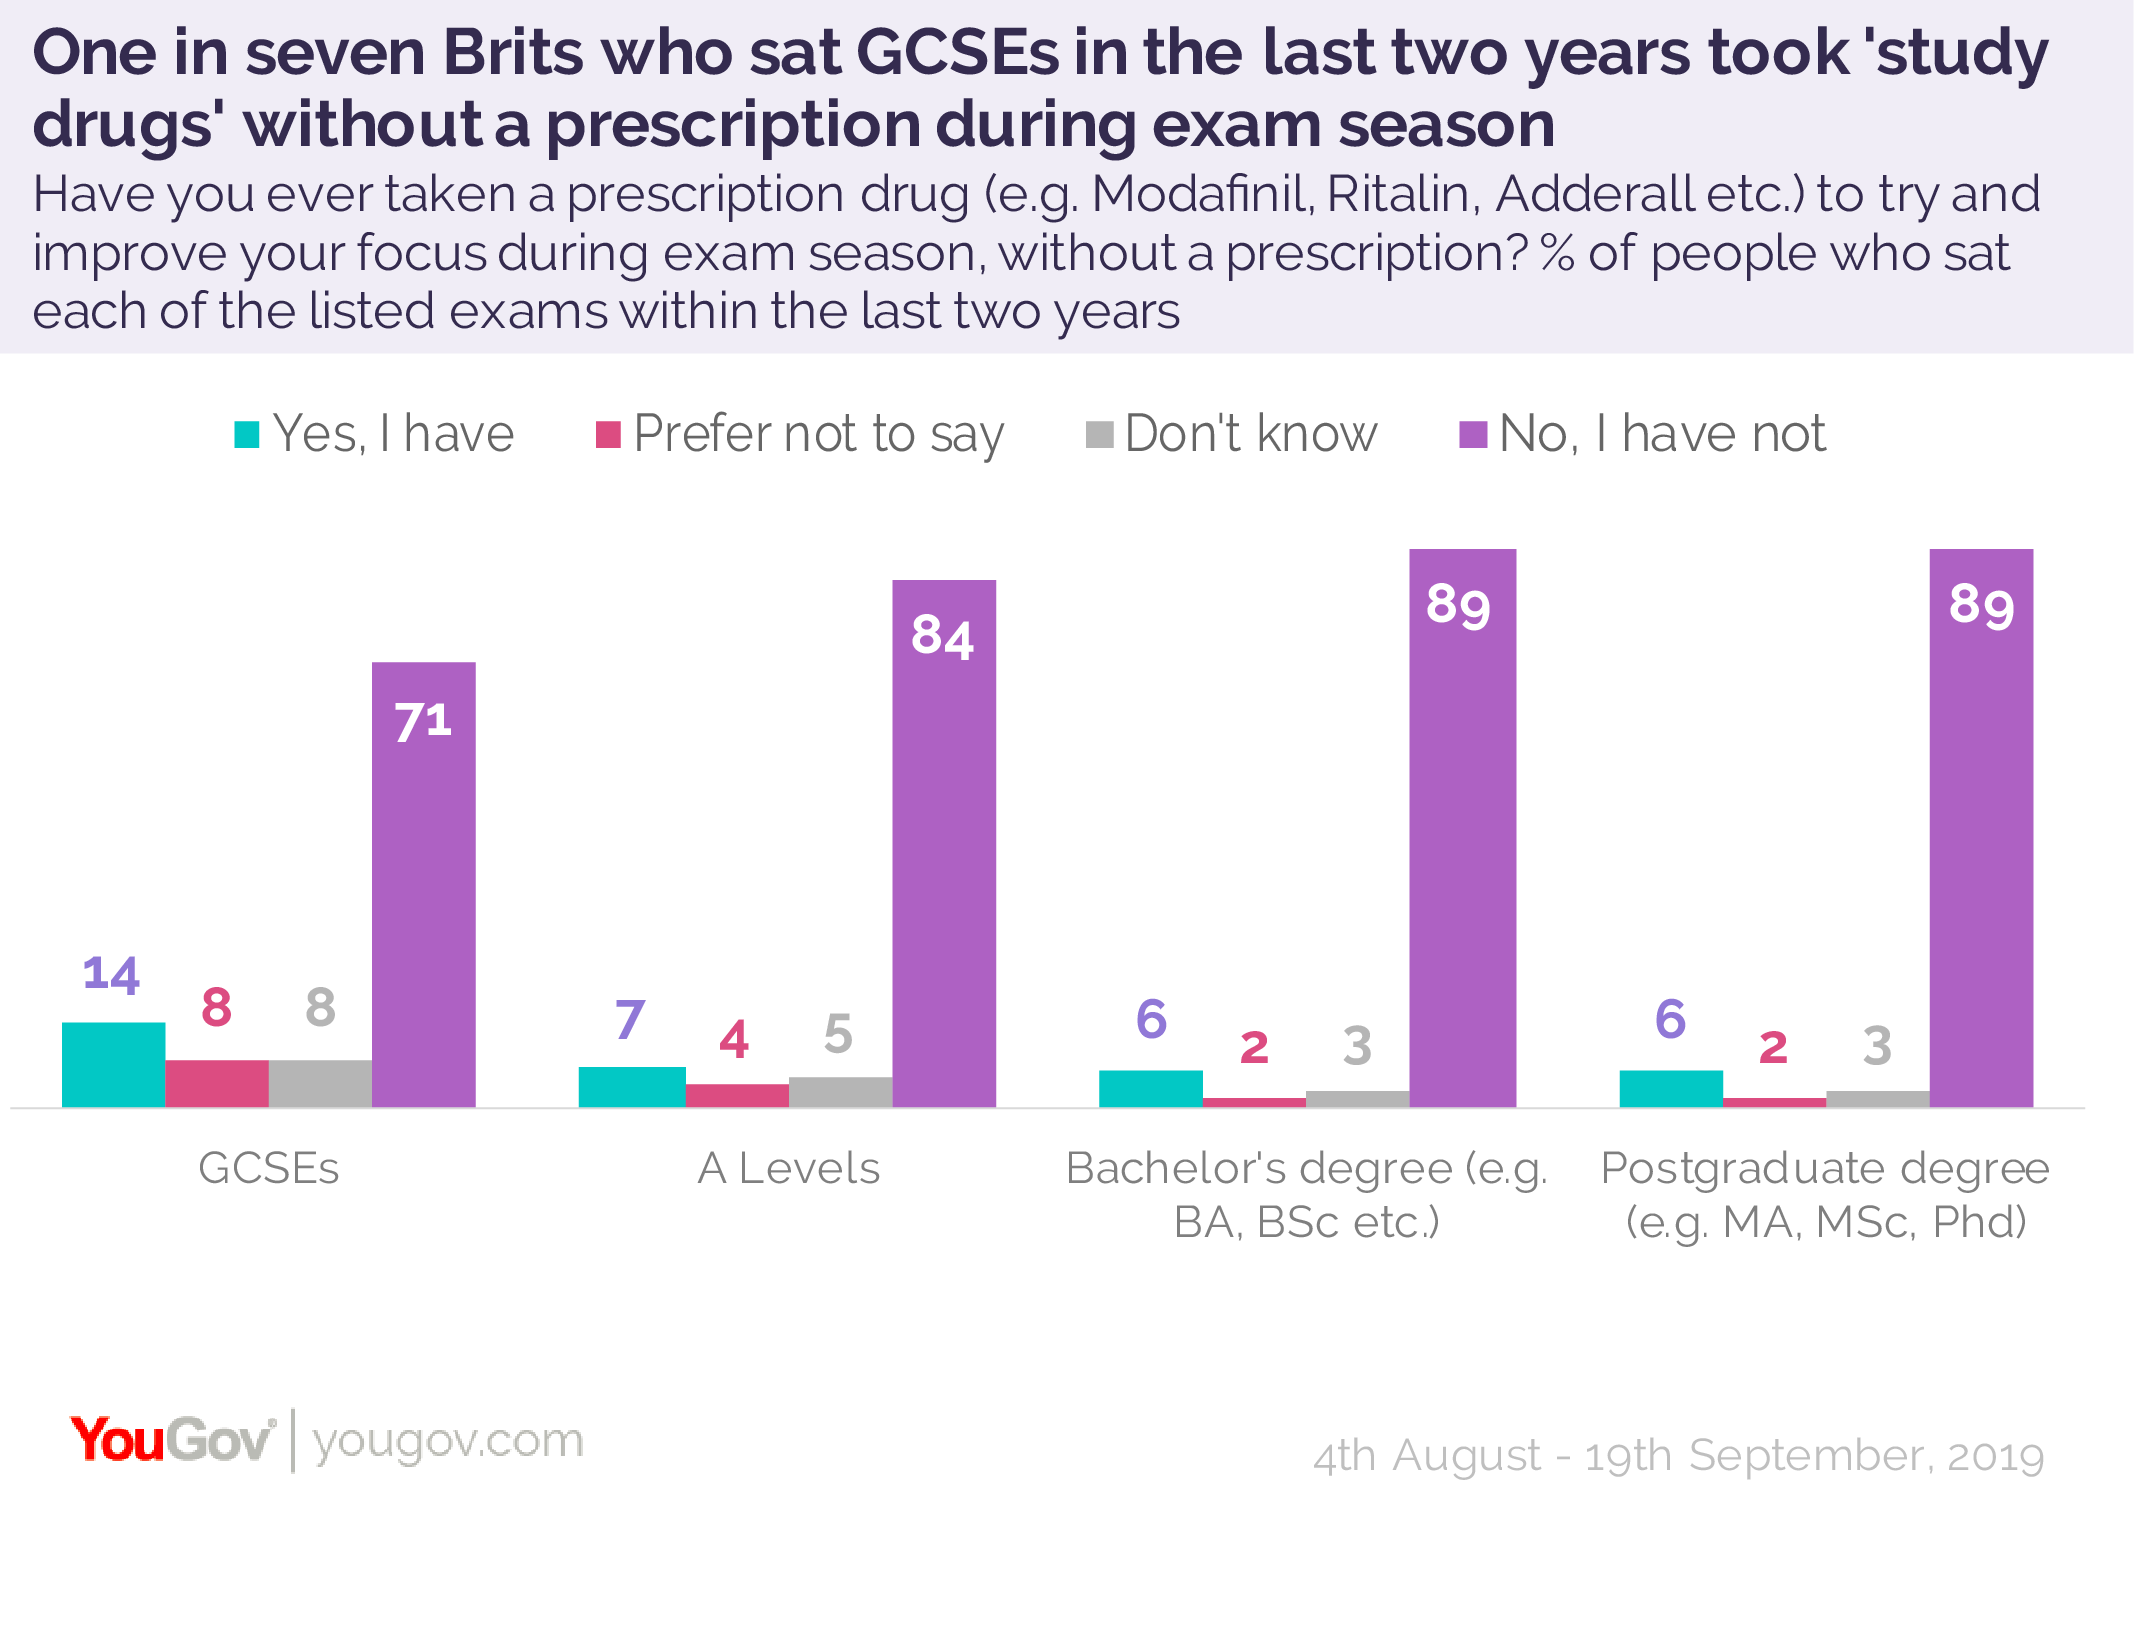 One in seven GCSE students taking black market 'study drugs